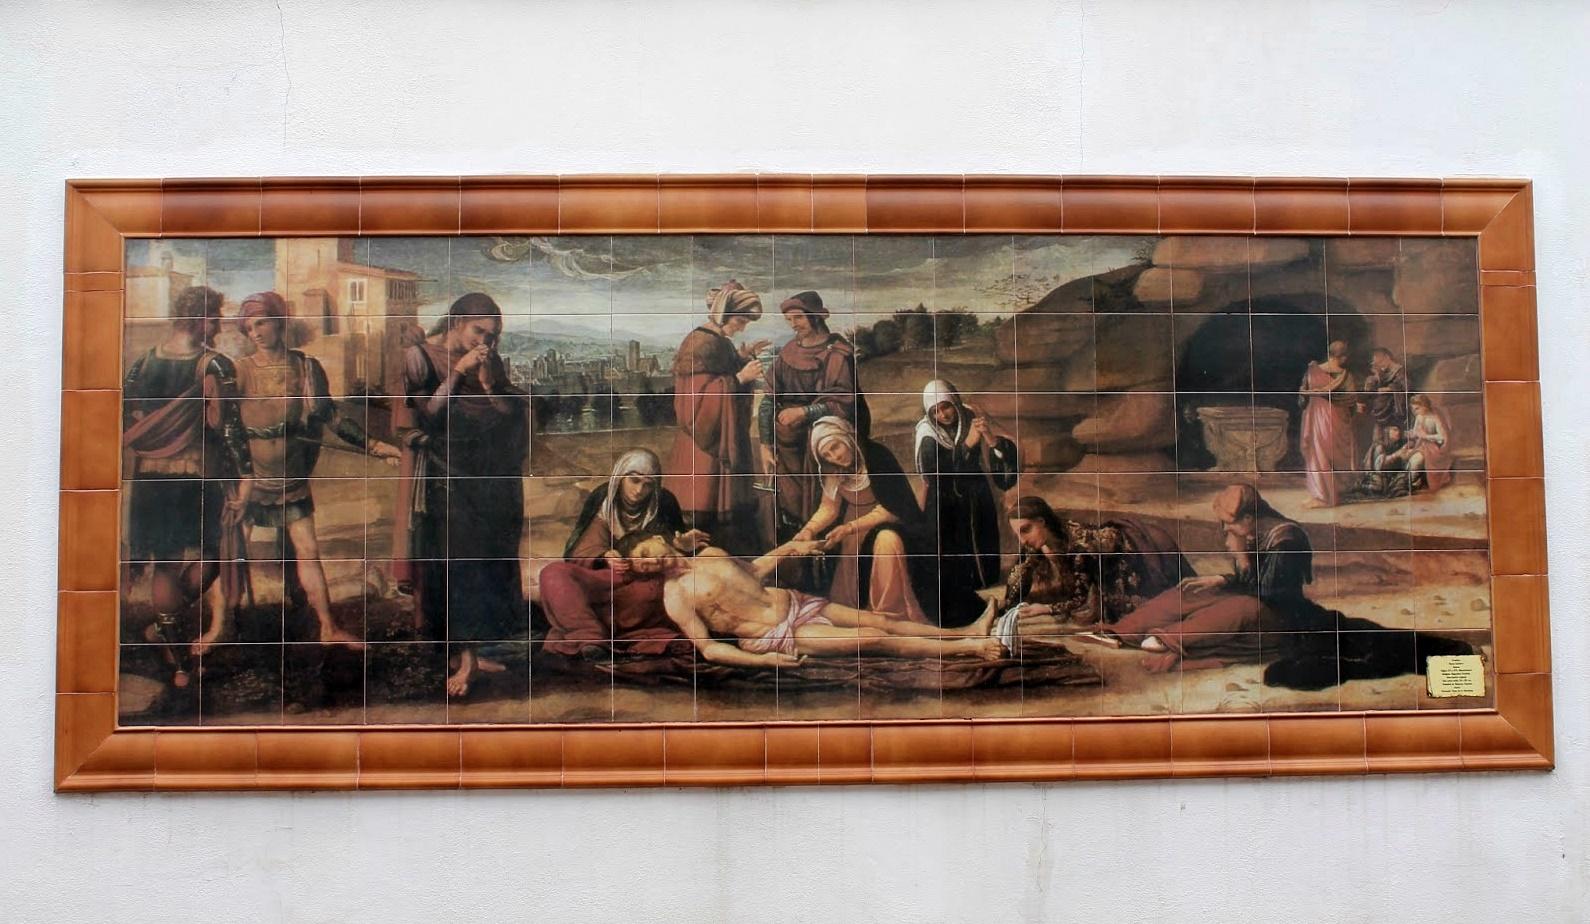 Museo al aire libre de Almedina 2